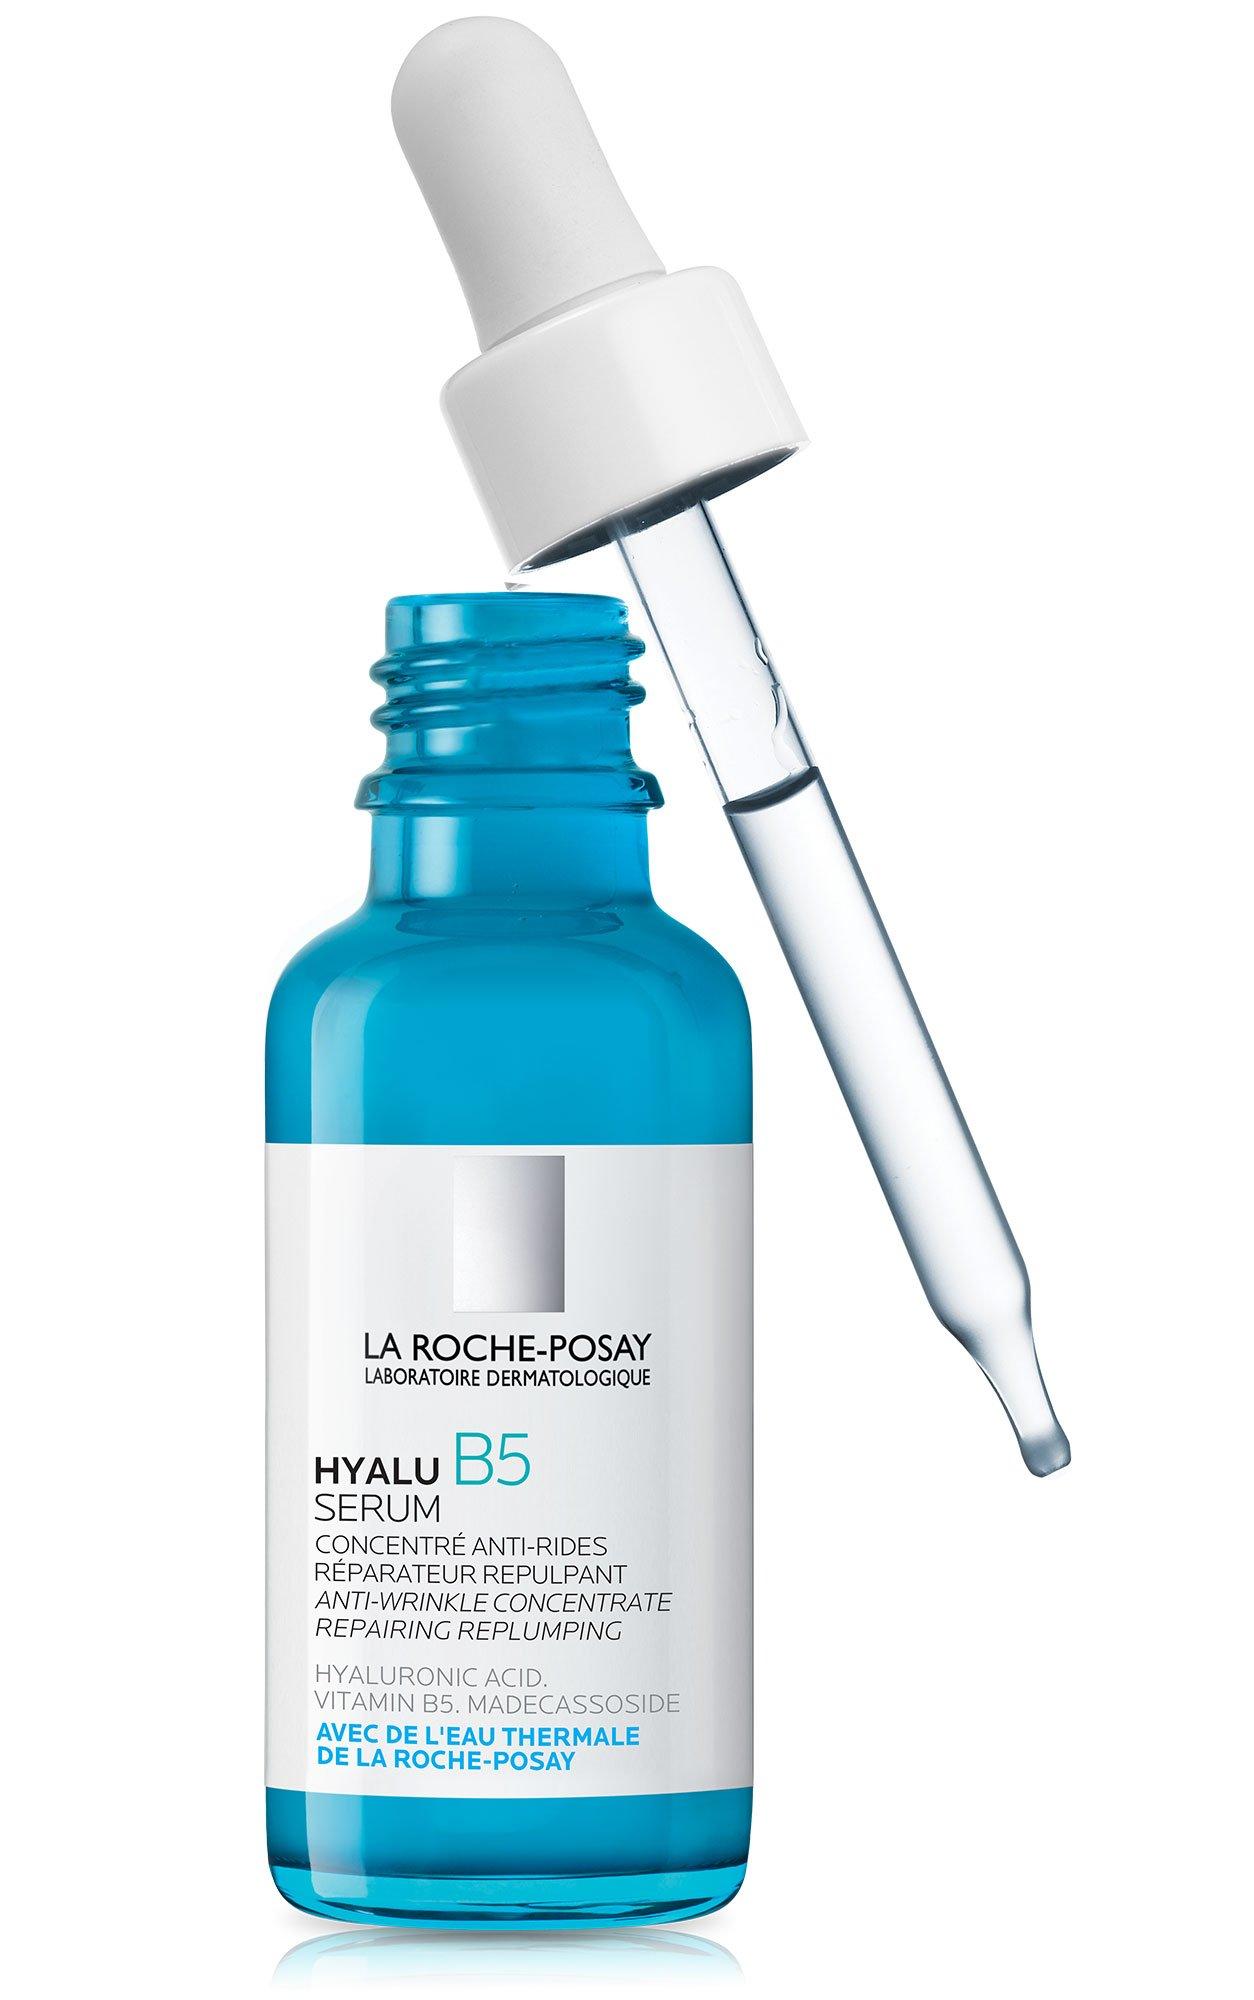 La Roche-Posay Hyalu B5 Hyaluronic Acid Serum Anti-Wrinkle Concentrate, 1.01 Fl. Oz. by La Roche-Posay